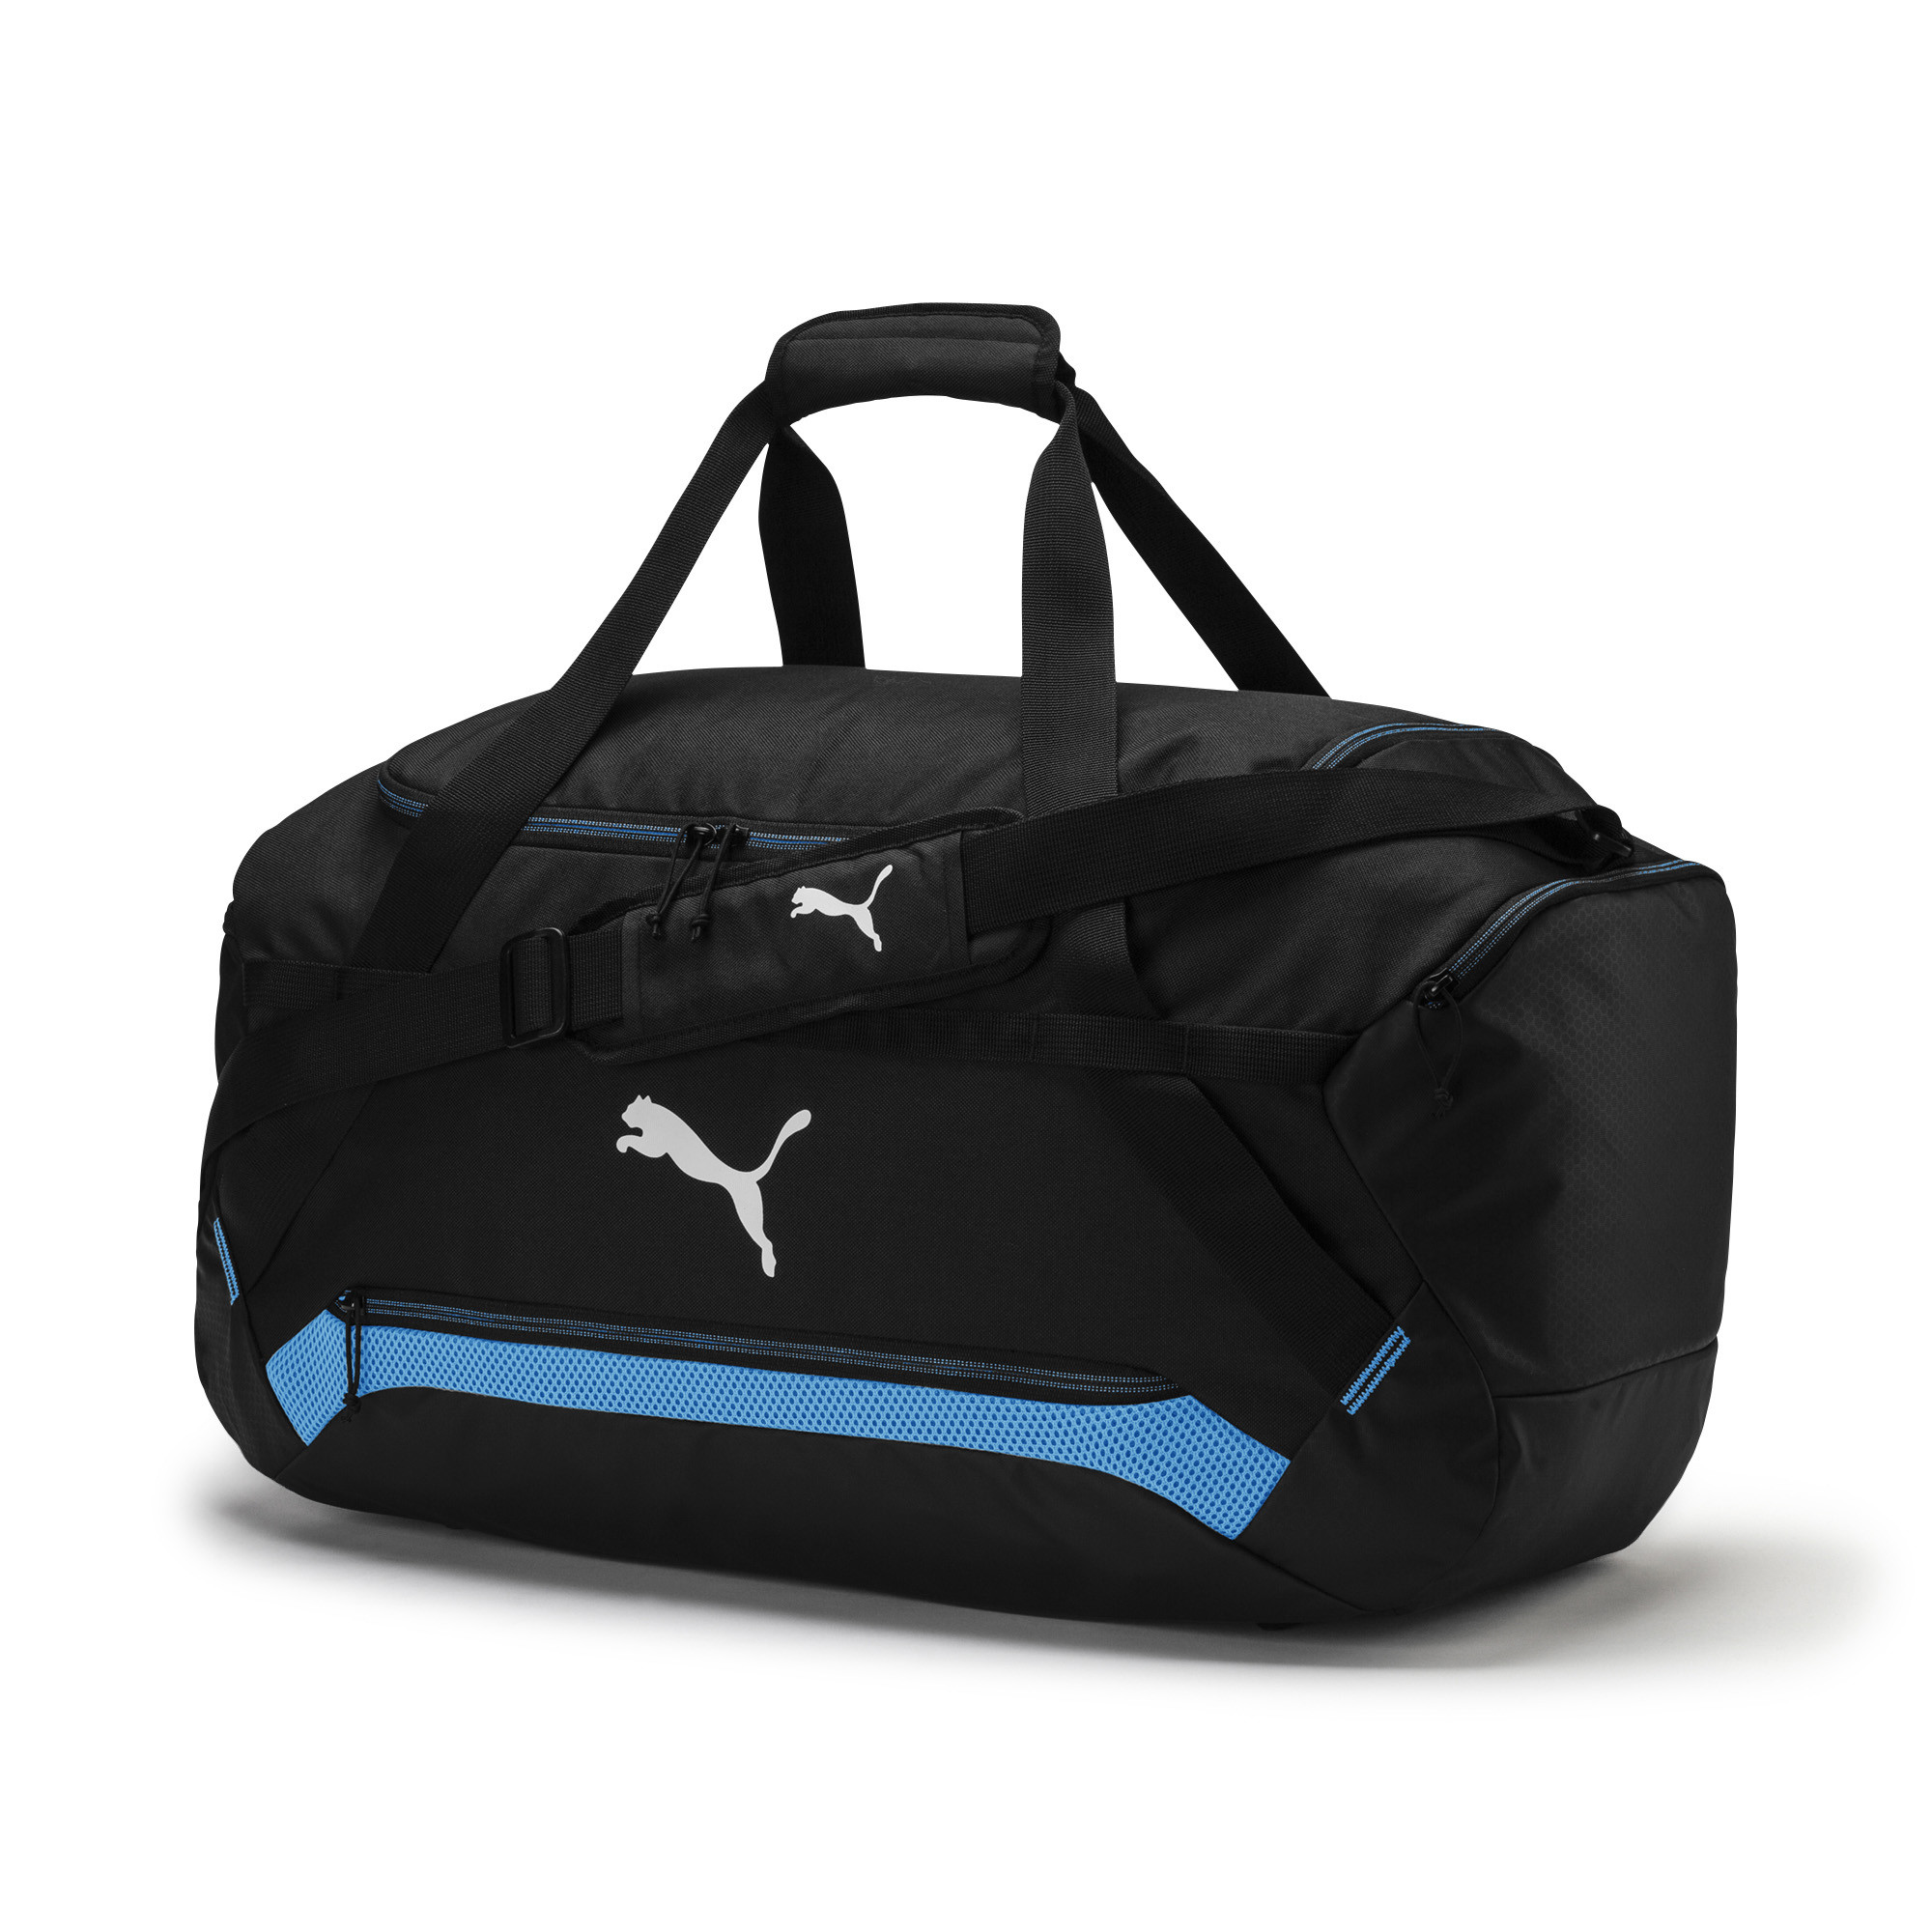 4f168b3f2ca Backpacks & Bags - Accessories - Womens